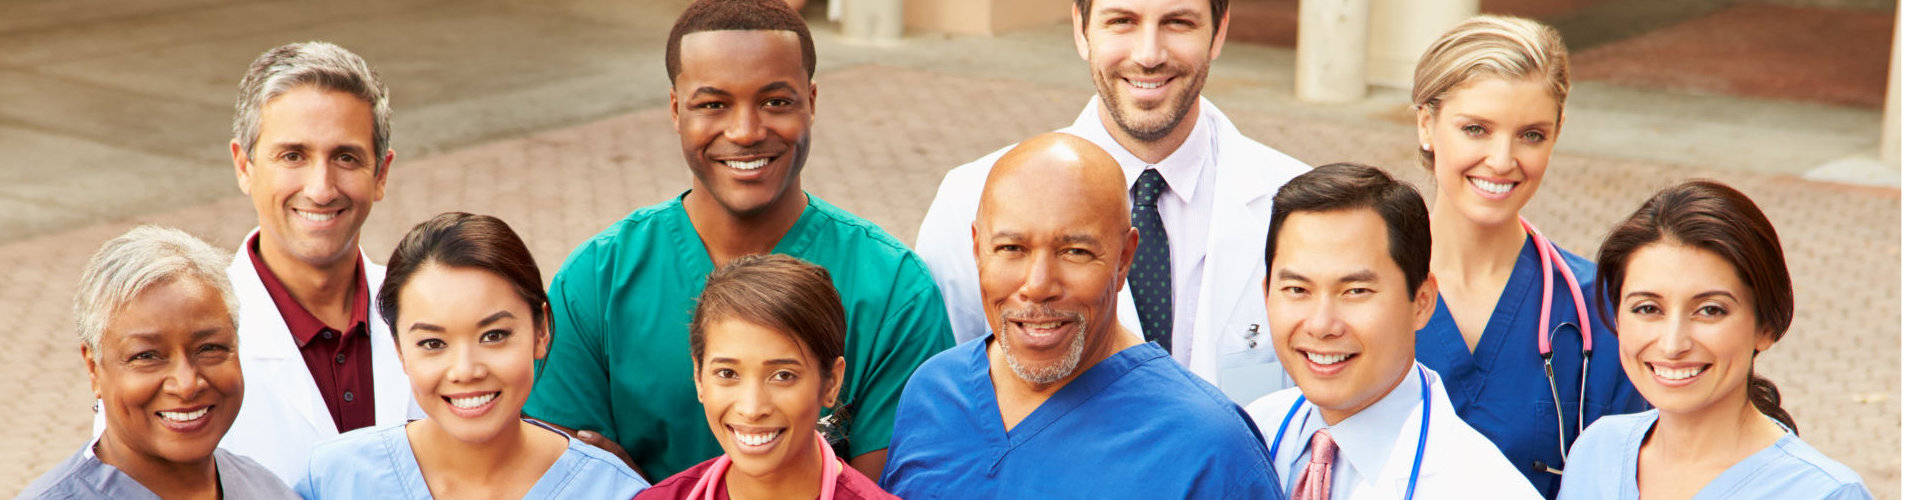 health care staff smiling